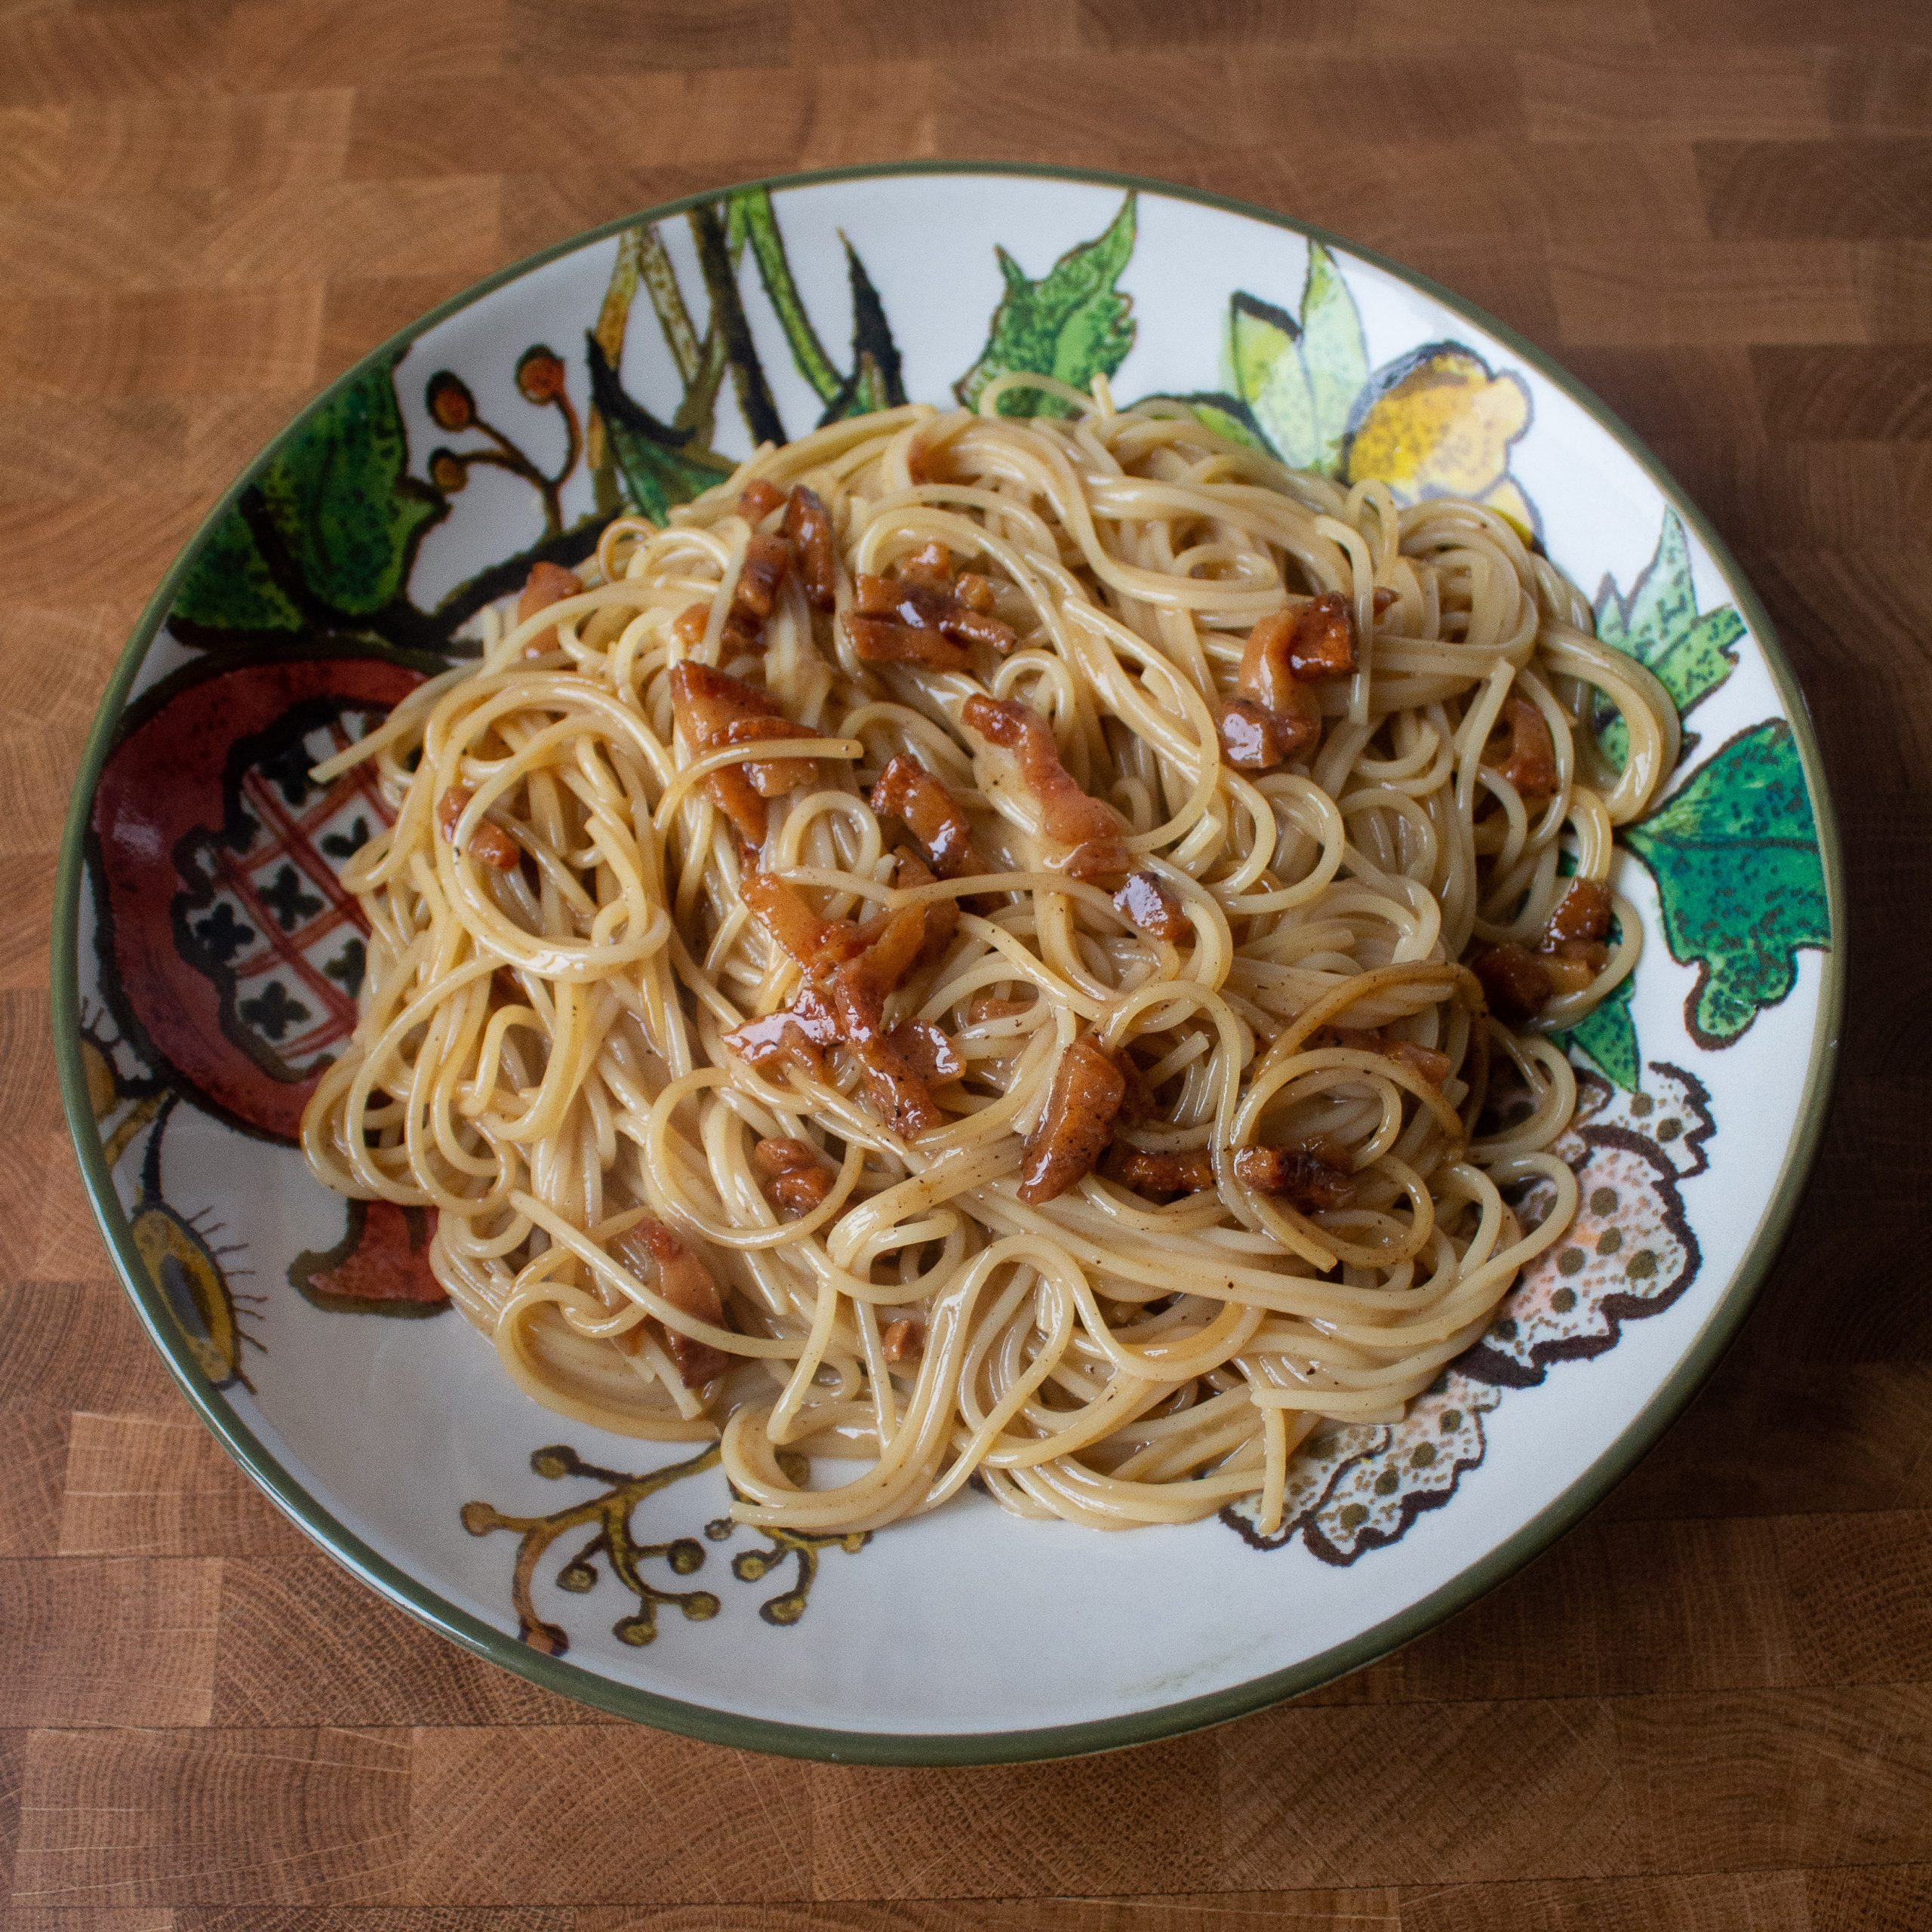 Carbonara, the Italian way! Sharing authentic pasta carbonara